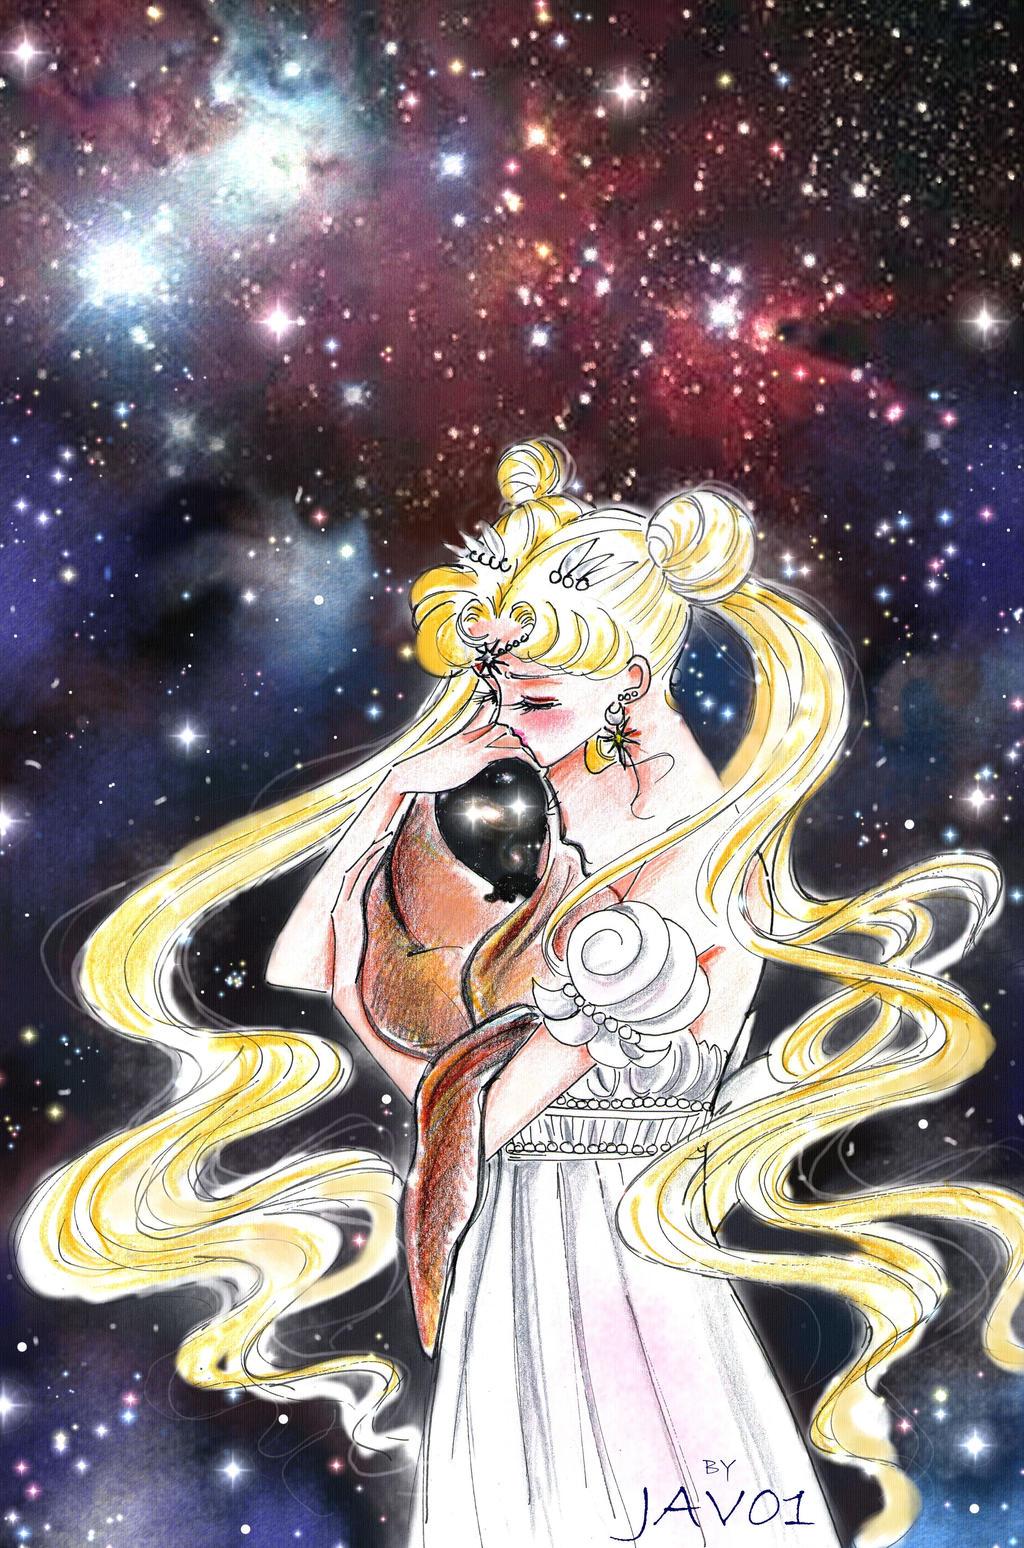 Sailor moon ( serenity ) - in the macrocosm by zelldinchit